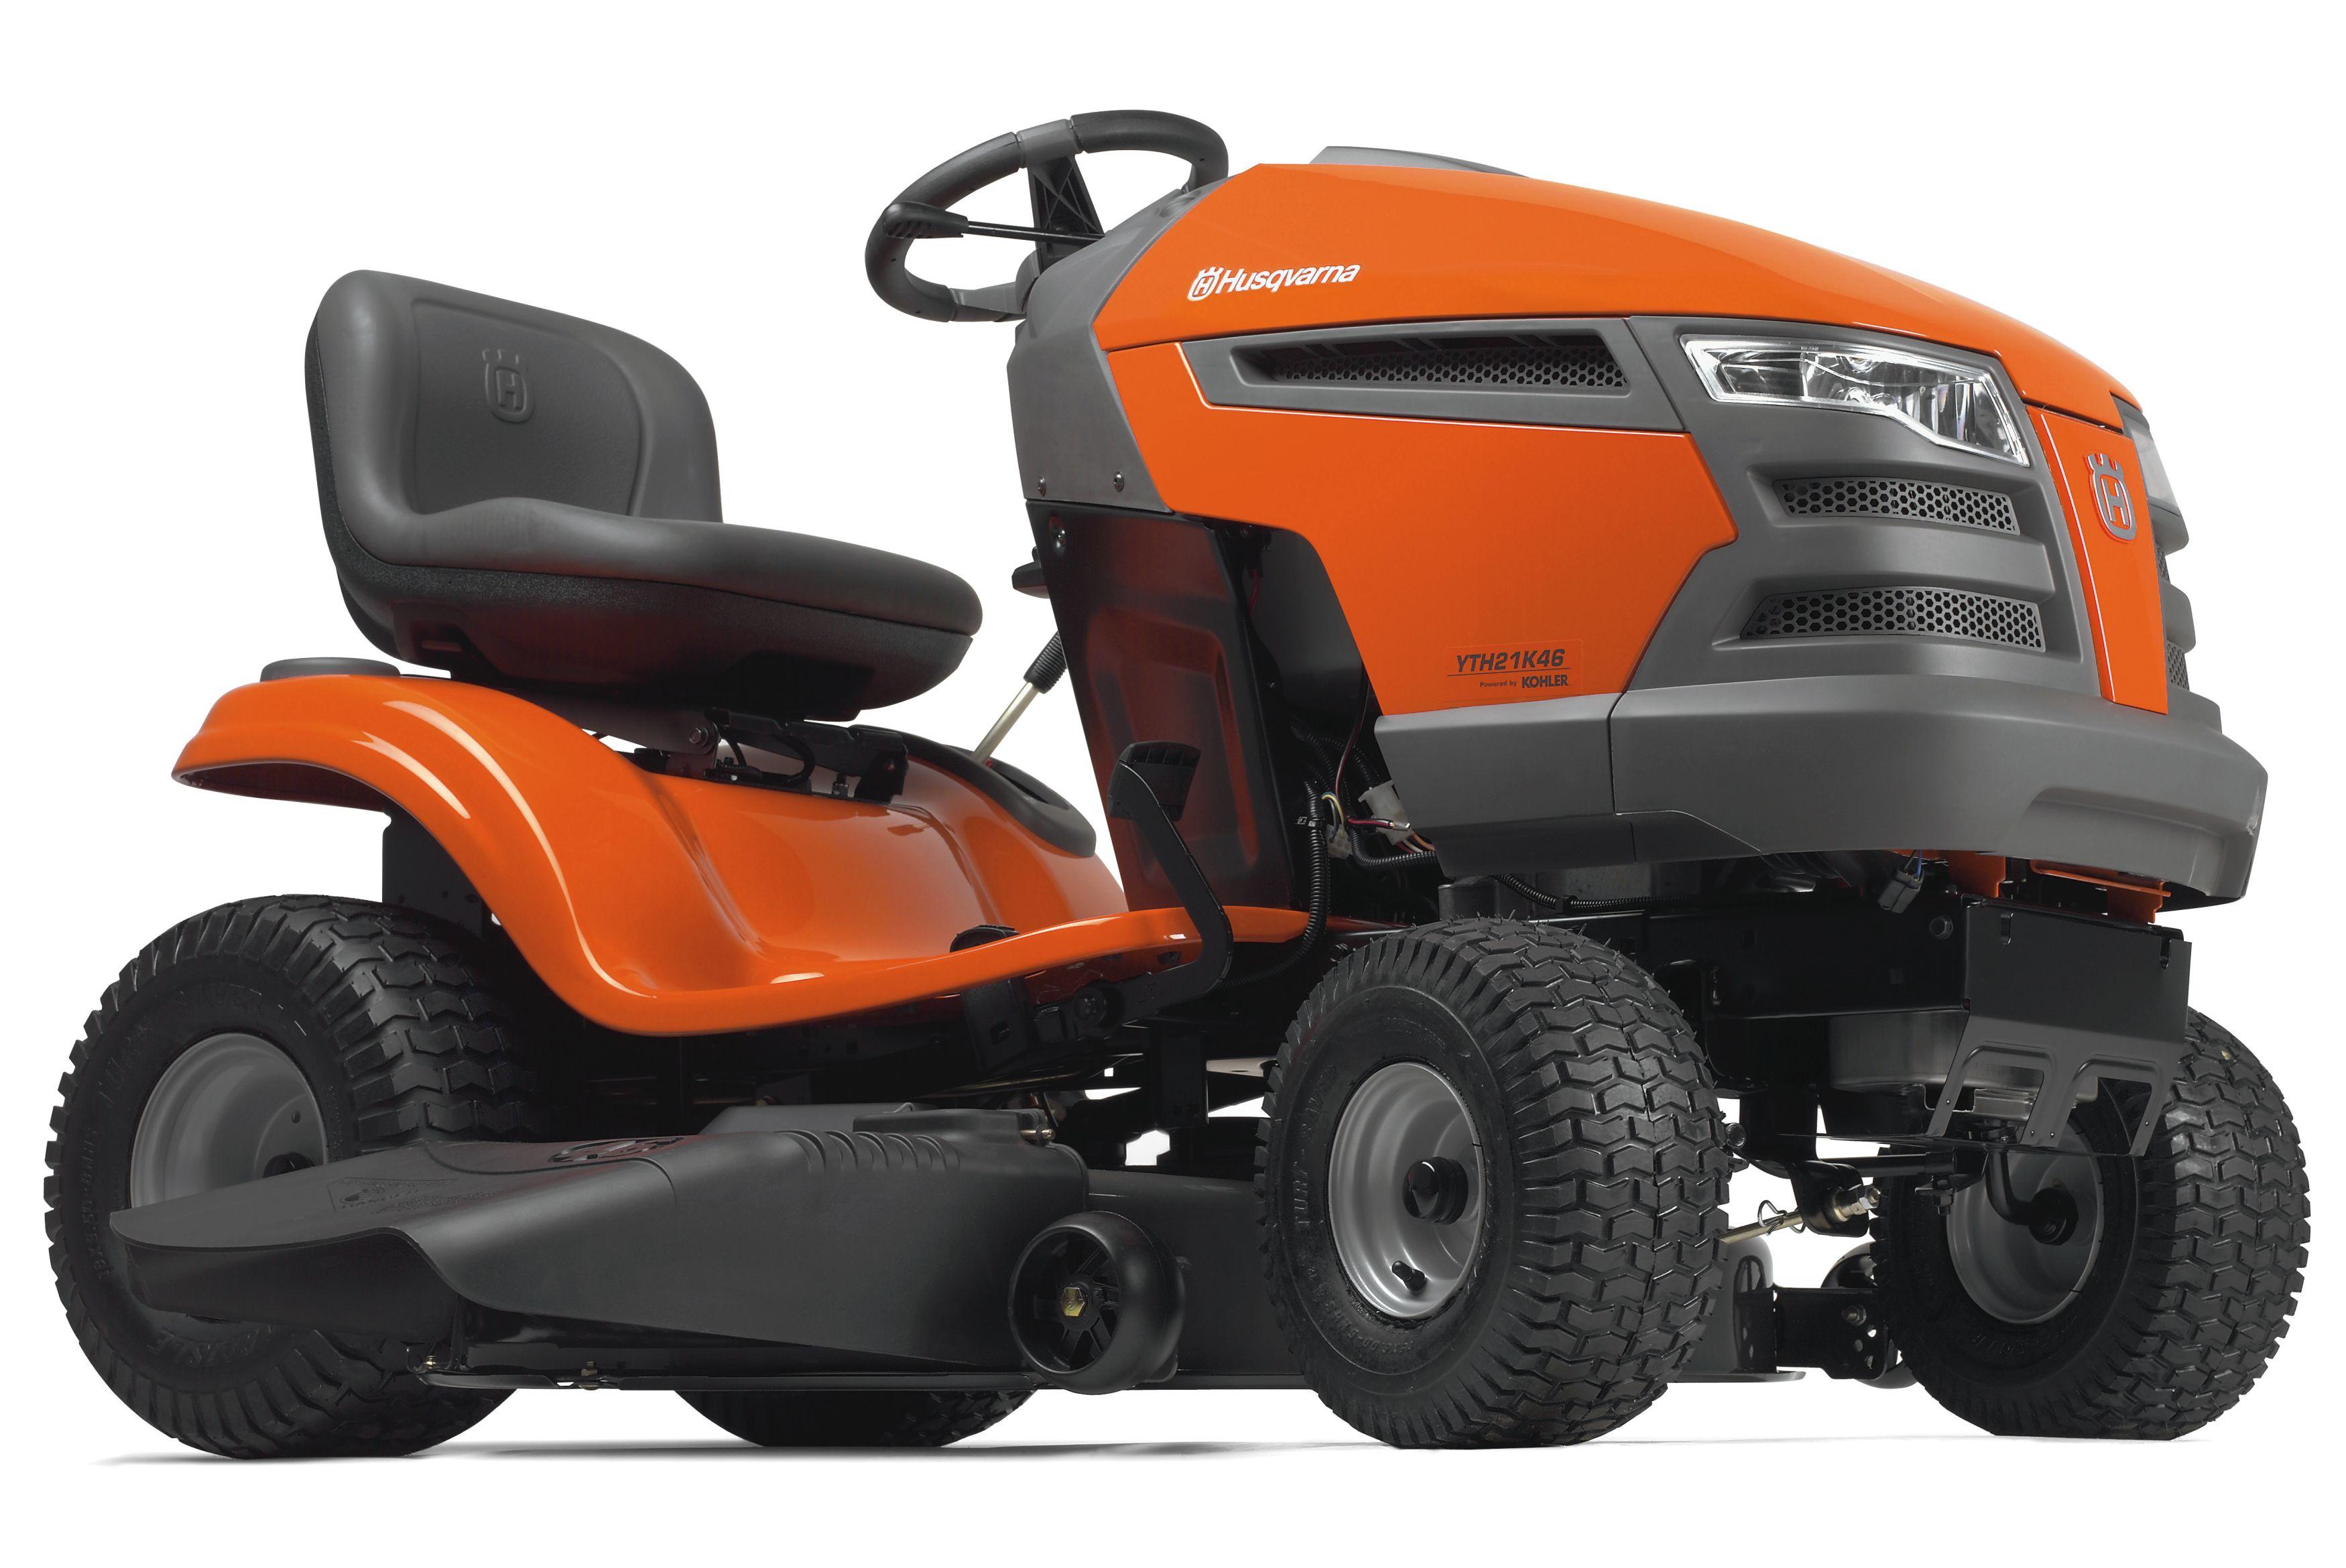 Husqvarna Lawn Mower Model Yth21k46 2011 01 Parts And